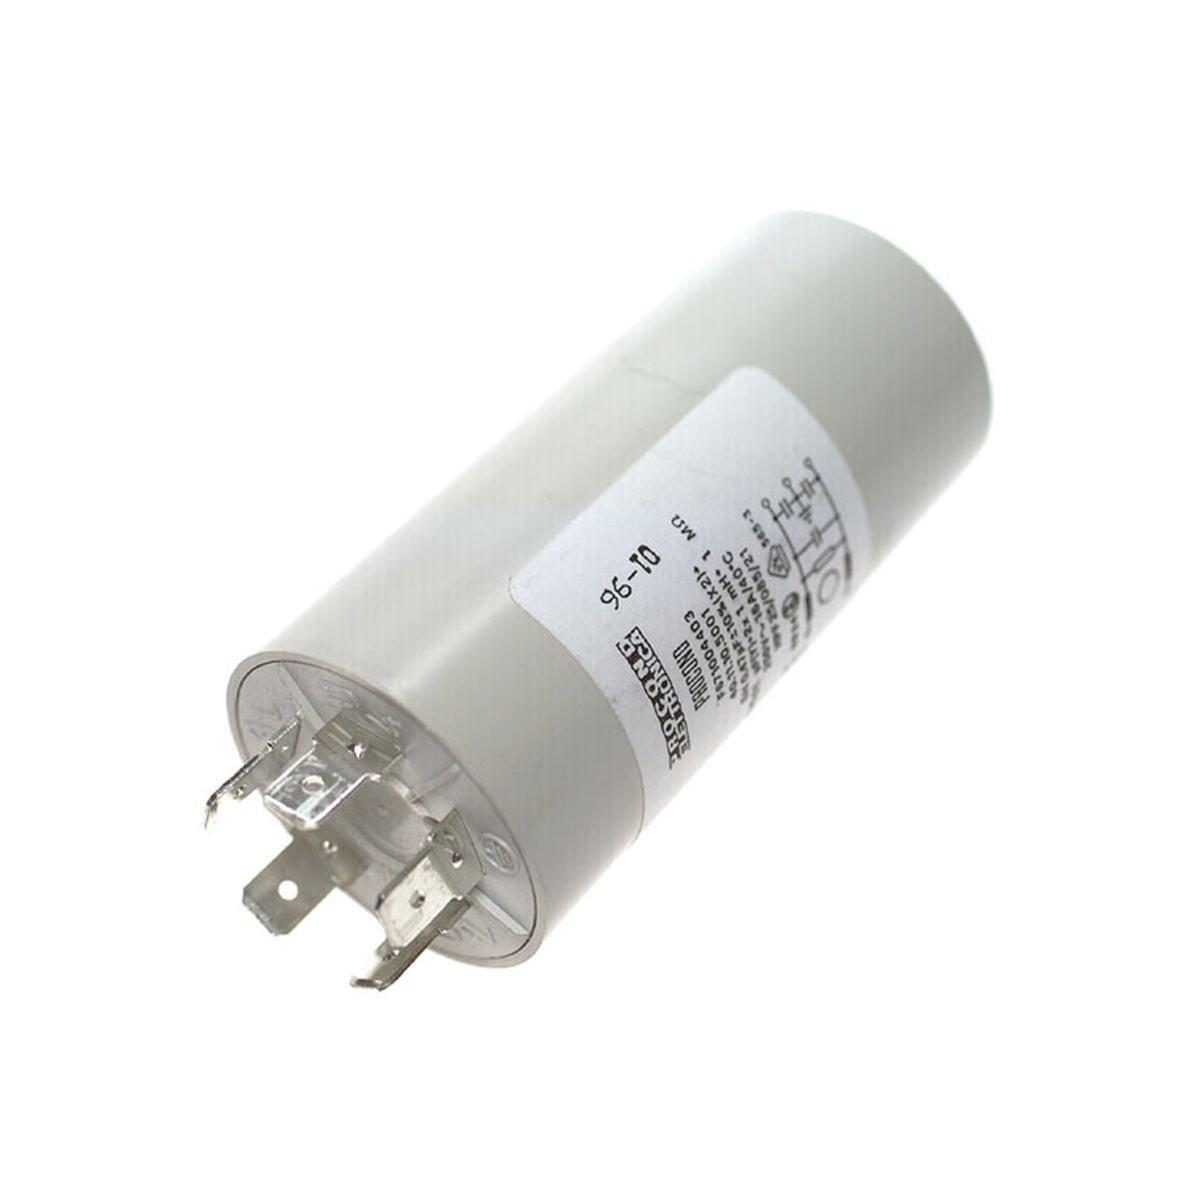 Kondensator 80,0 µF 450V